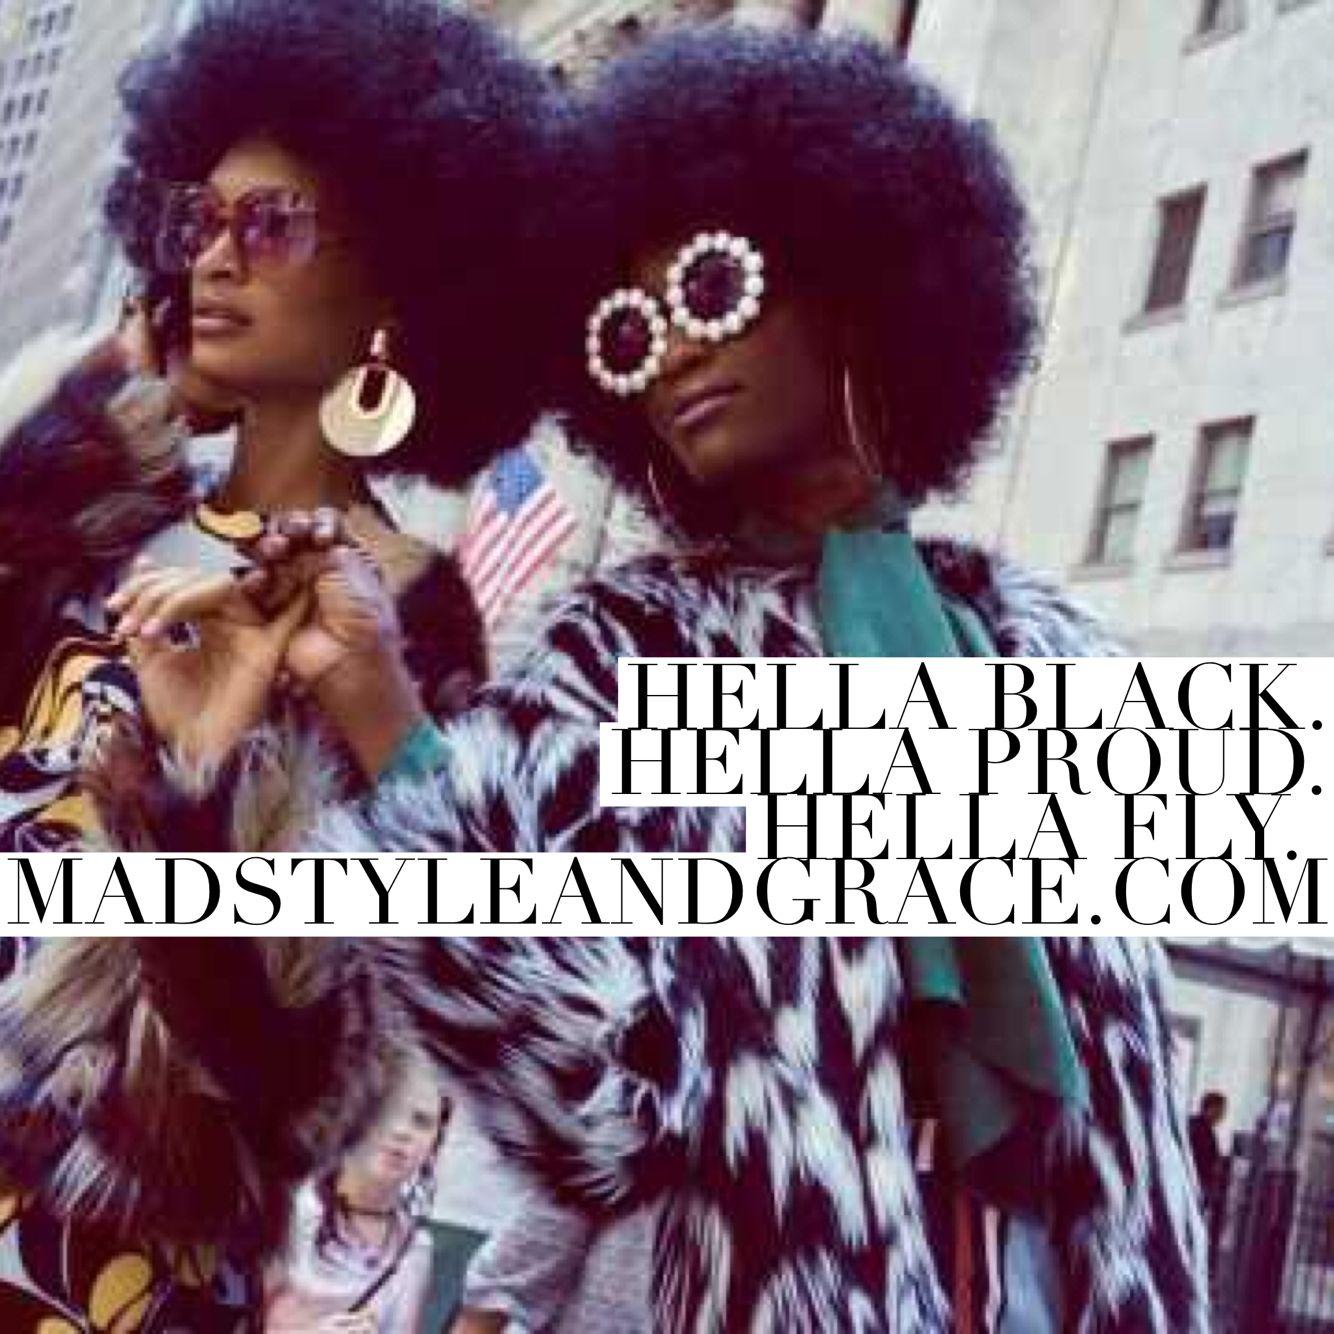 Via my IG, Fly Carla  #blackbeauty #goddess #Queen #blackgirlmagic #sisterhood #blackisbeautiful #beauty #community #love #blackgirlswinning #Happiness #royalty #womenofcolor #blackwoman #gold #Culture #crown #blackgirlsrock #sisters #melaninonfleek #BlackQueens #younggiftedandblack #blackgirlsaremagic #blackgirls